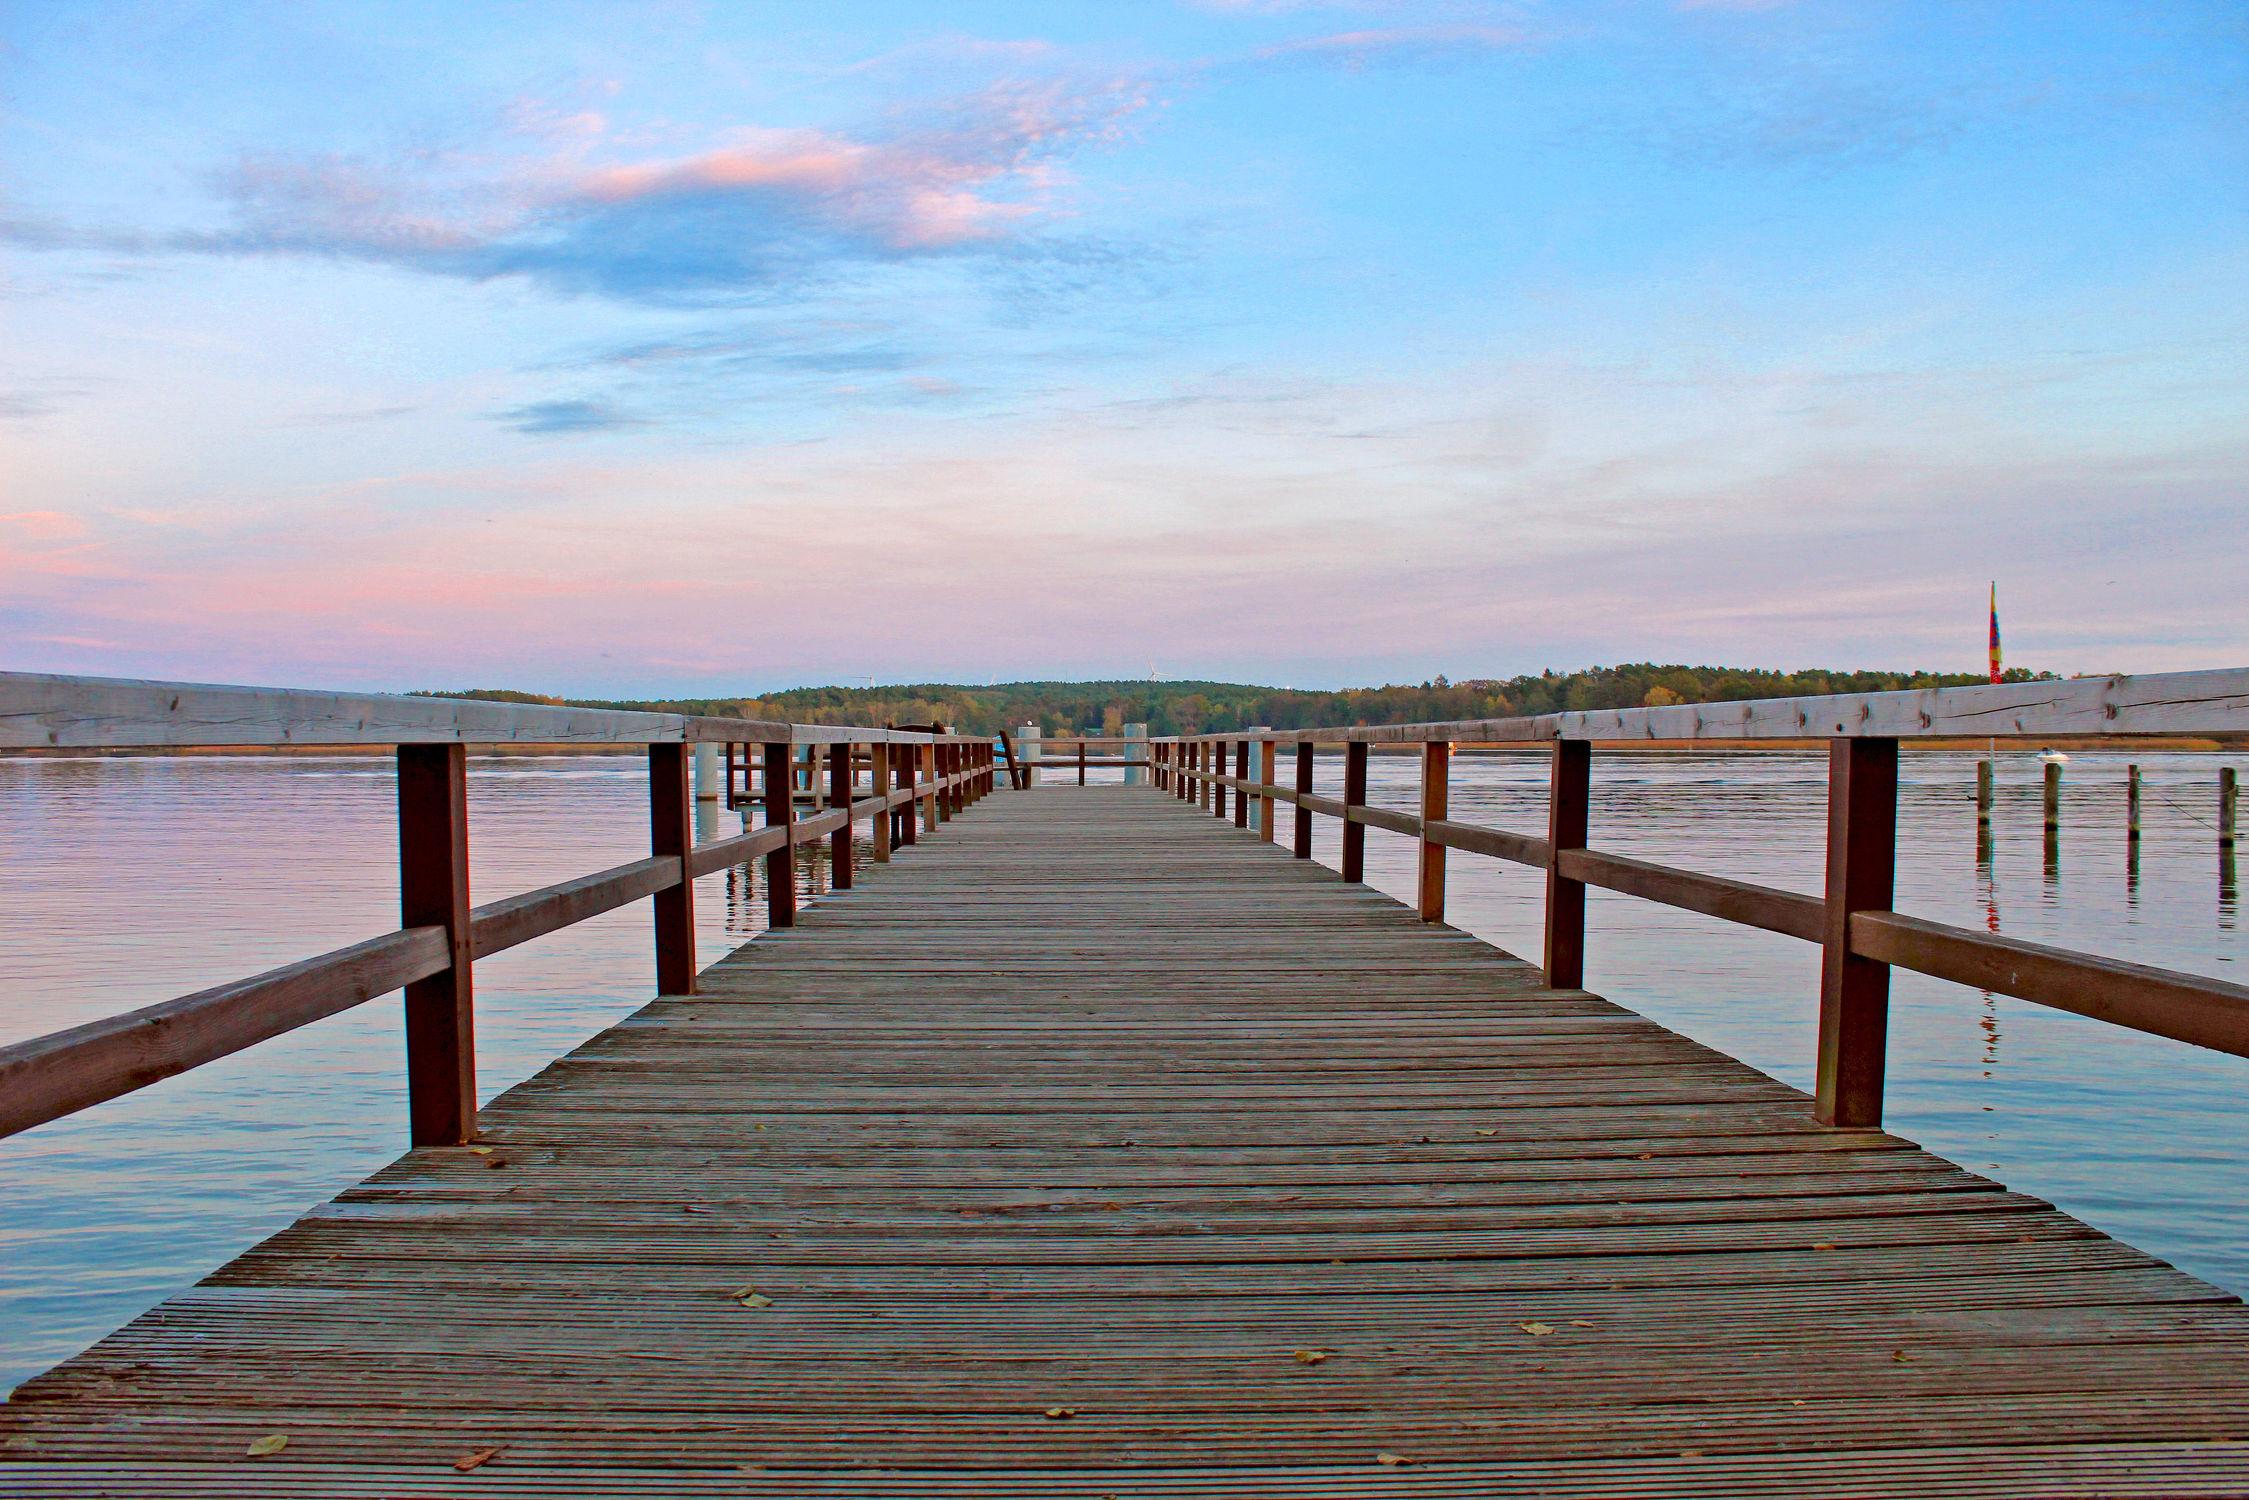 Bild mit Gewässer, Sonnenuntergang, Sonnenaufgang, Meer, Steg, Sunset, Holzsteg, Scharmützelsee